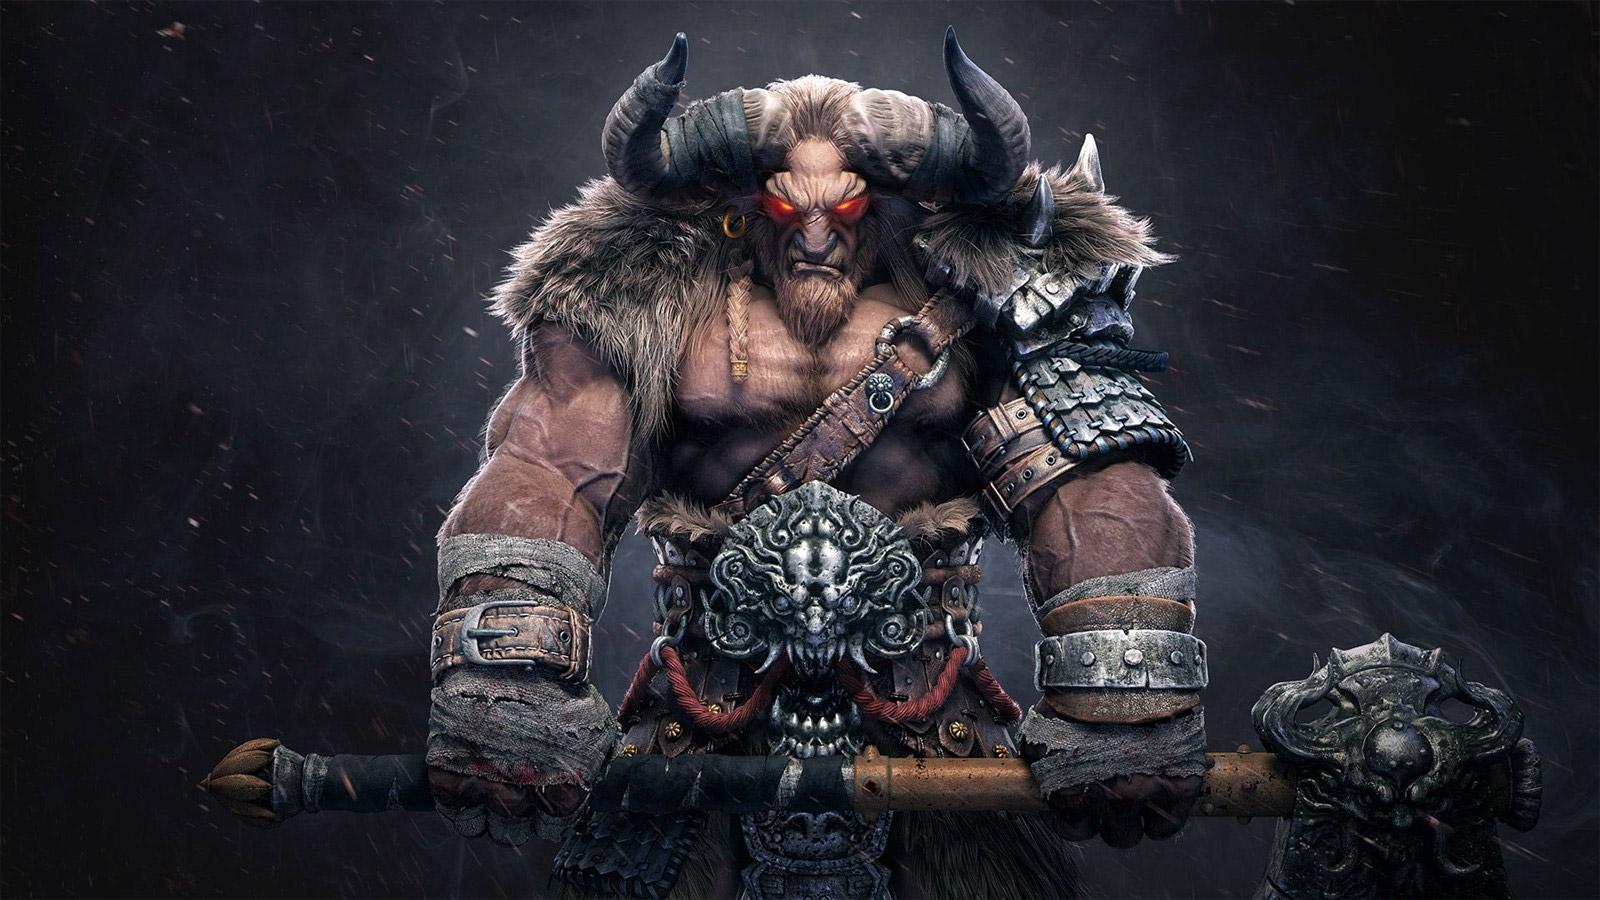 China Girl Wallpaper Full Hd Fantasy Art Bull Demon King 2d Digital Fantasycoolvibe